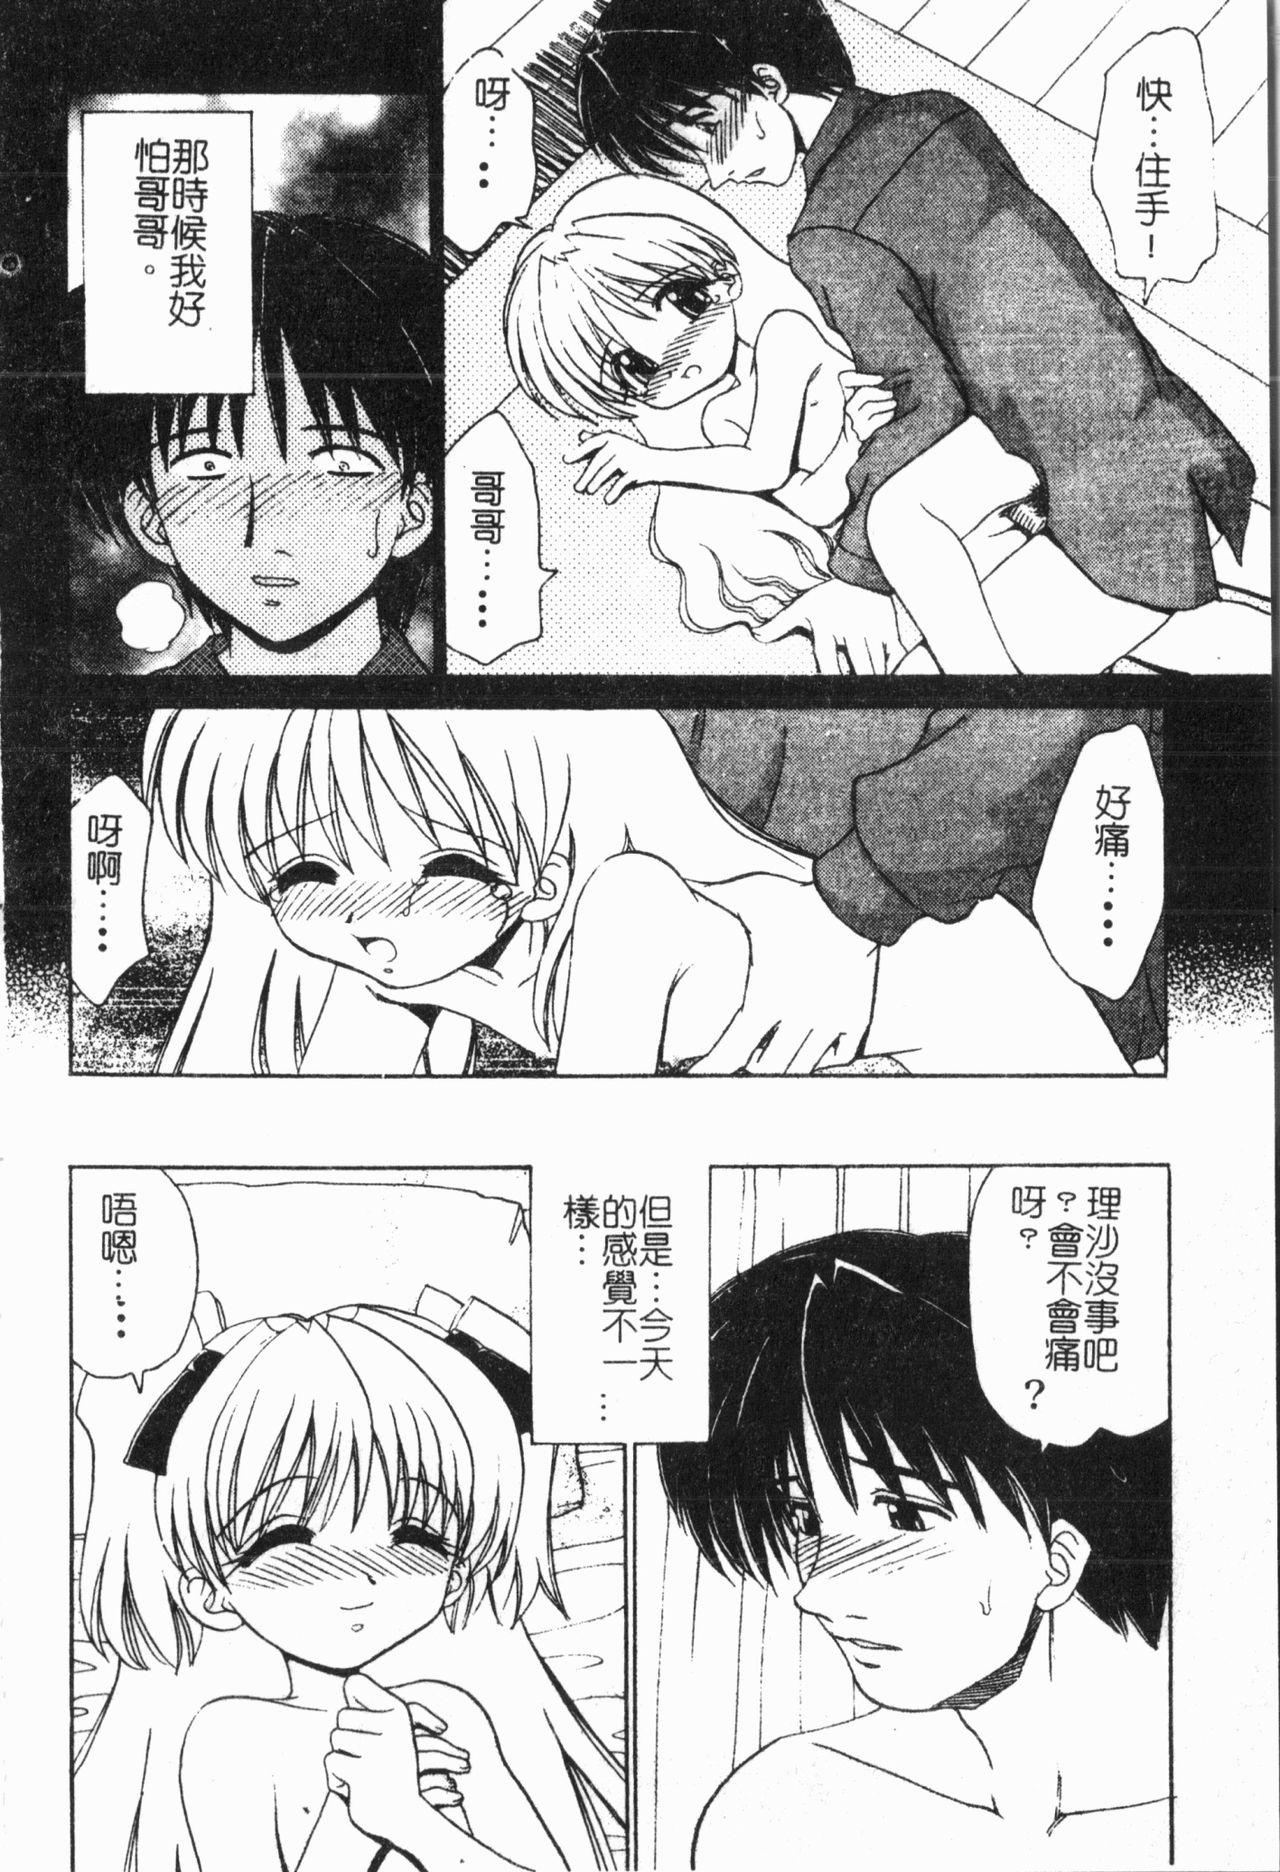 Imouto Koishi 6 142